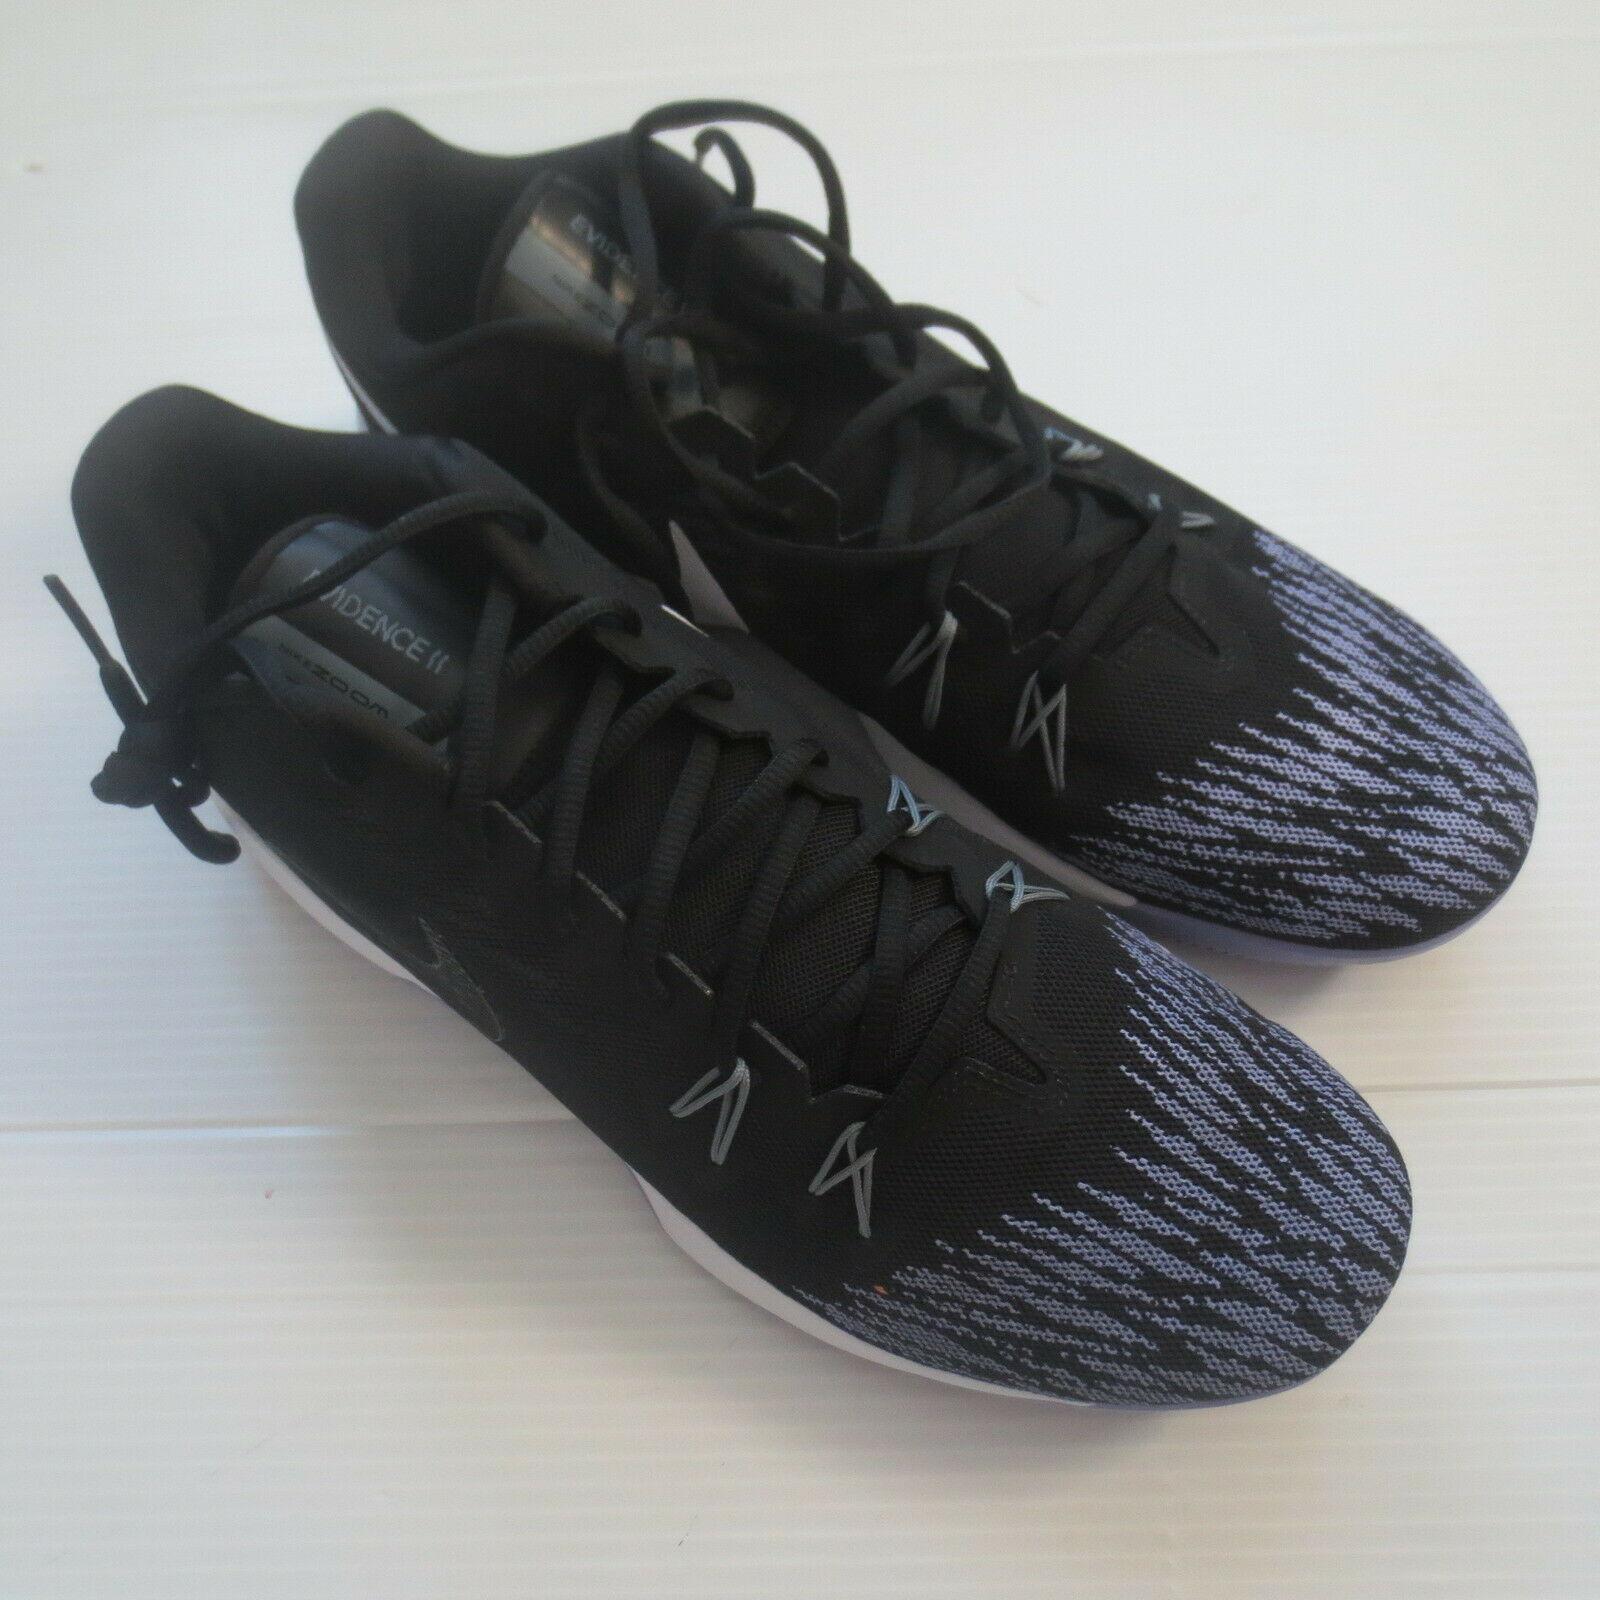 Nike Zoom Evidence II Shoes - 908976 - Black Lavender 105 - Size 14 - NEW